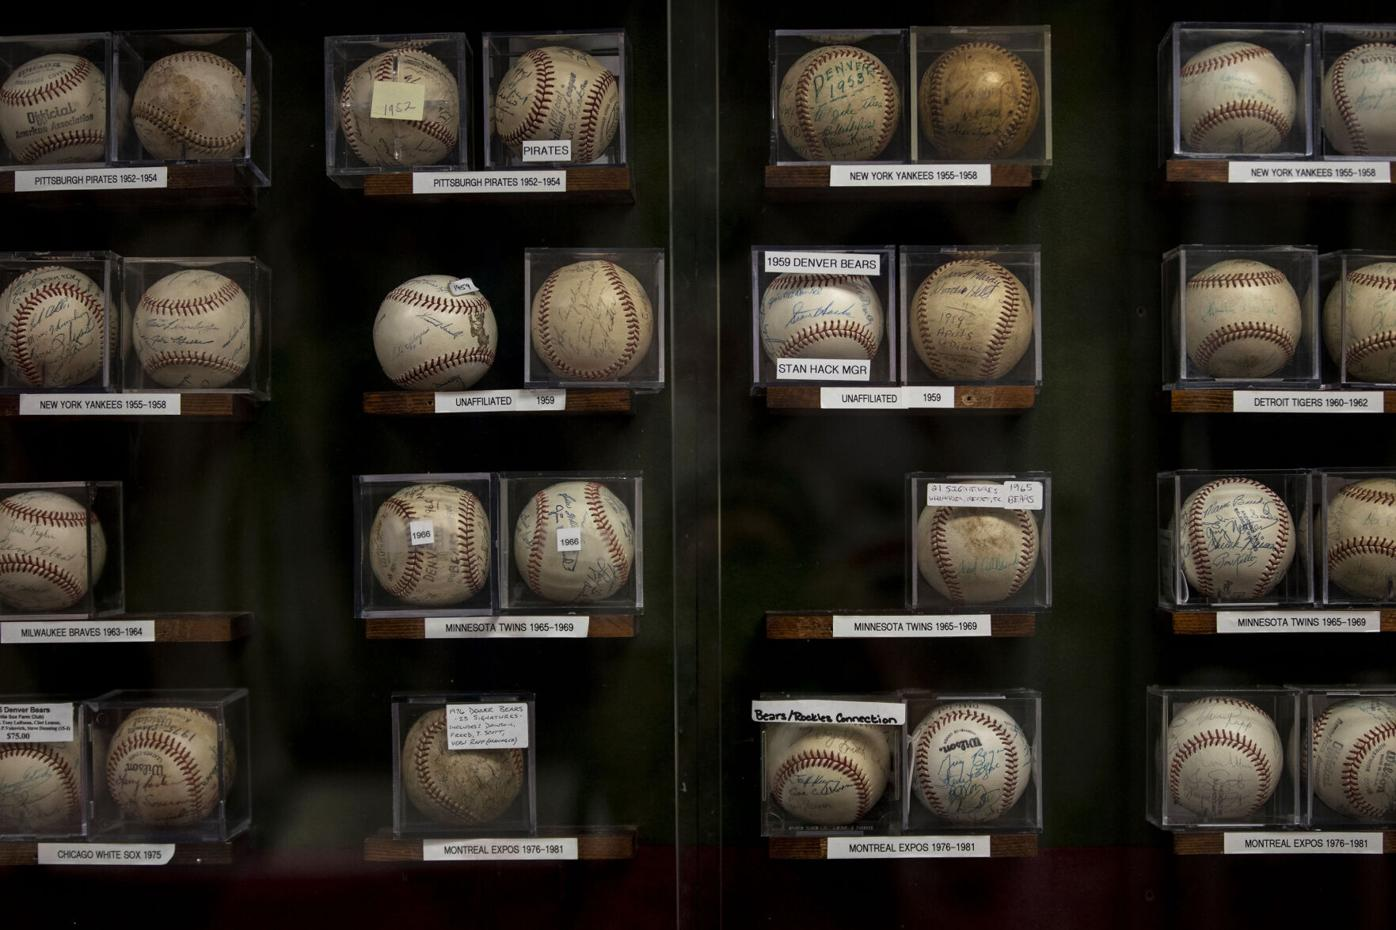 07xx21-news-ballparkmuseum 02.jpg